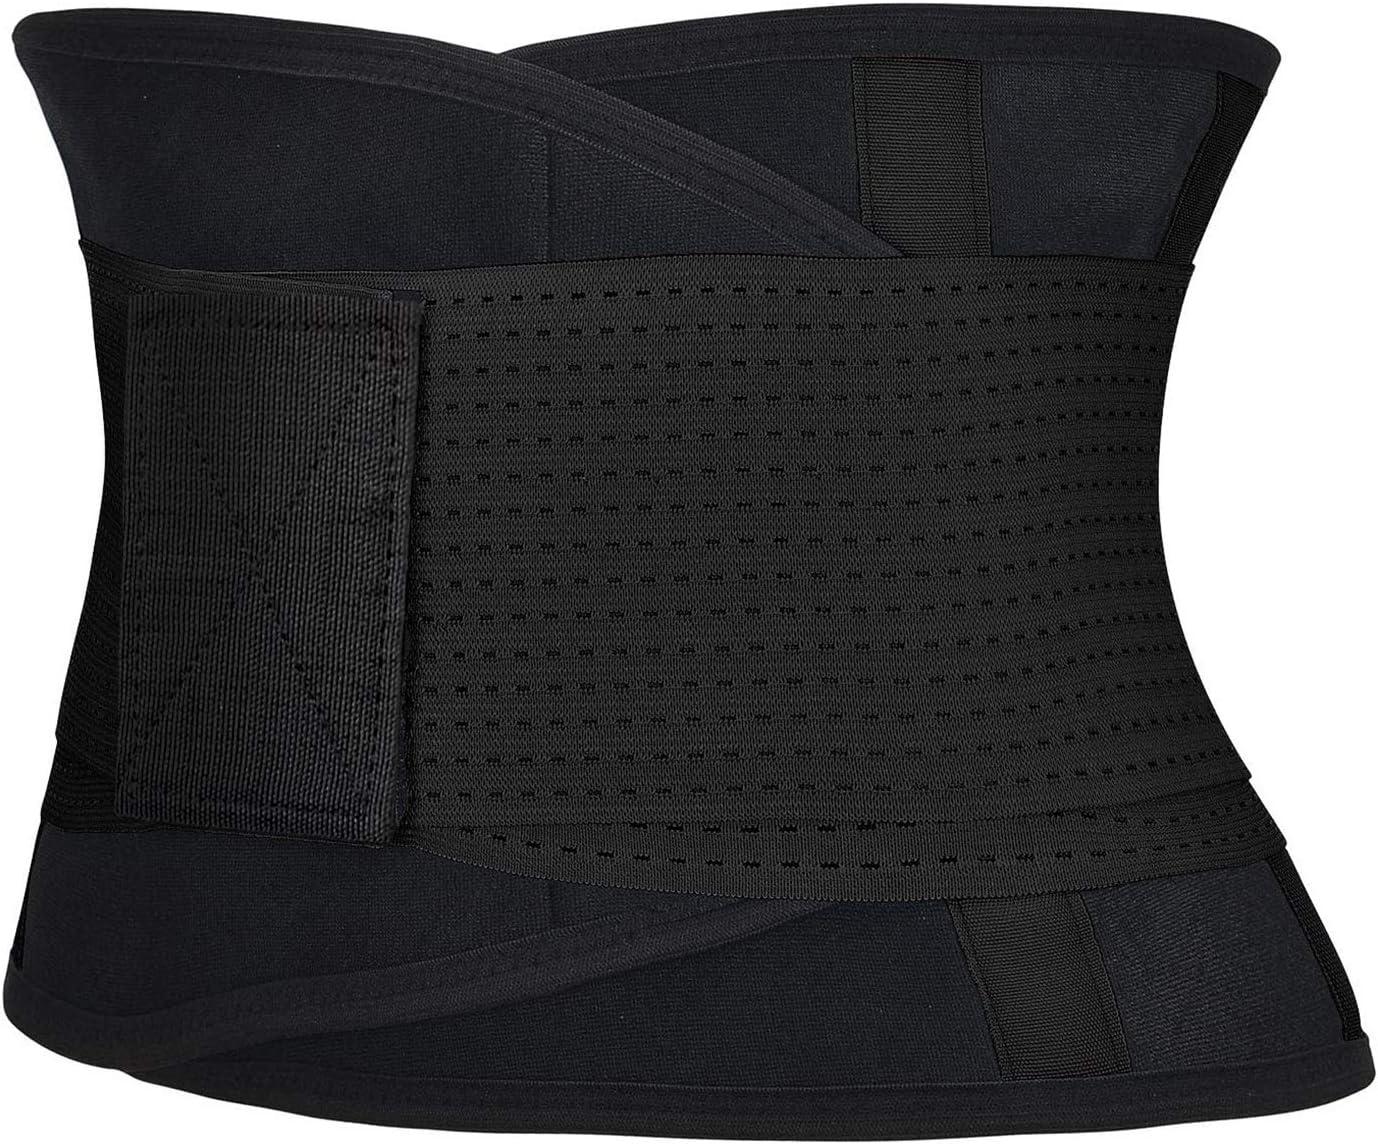 Aoge Premium Waist Trainer for Women Back Support Workout Belt Neoprene Slimming Waist Trimmer Double Compression Straps